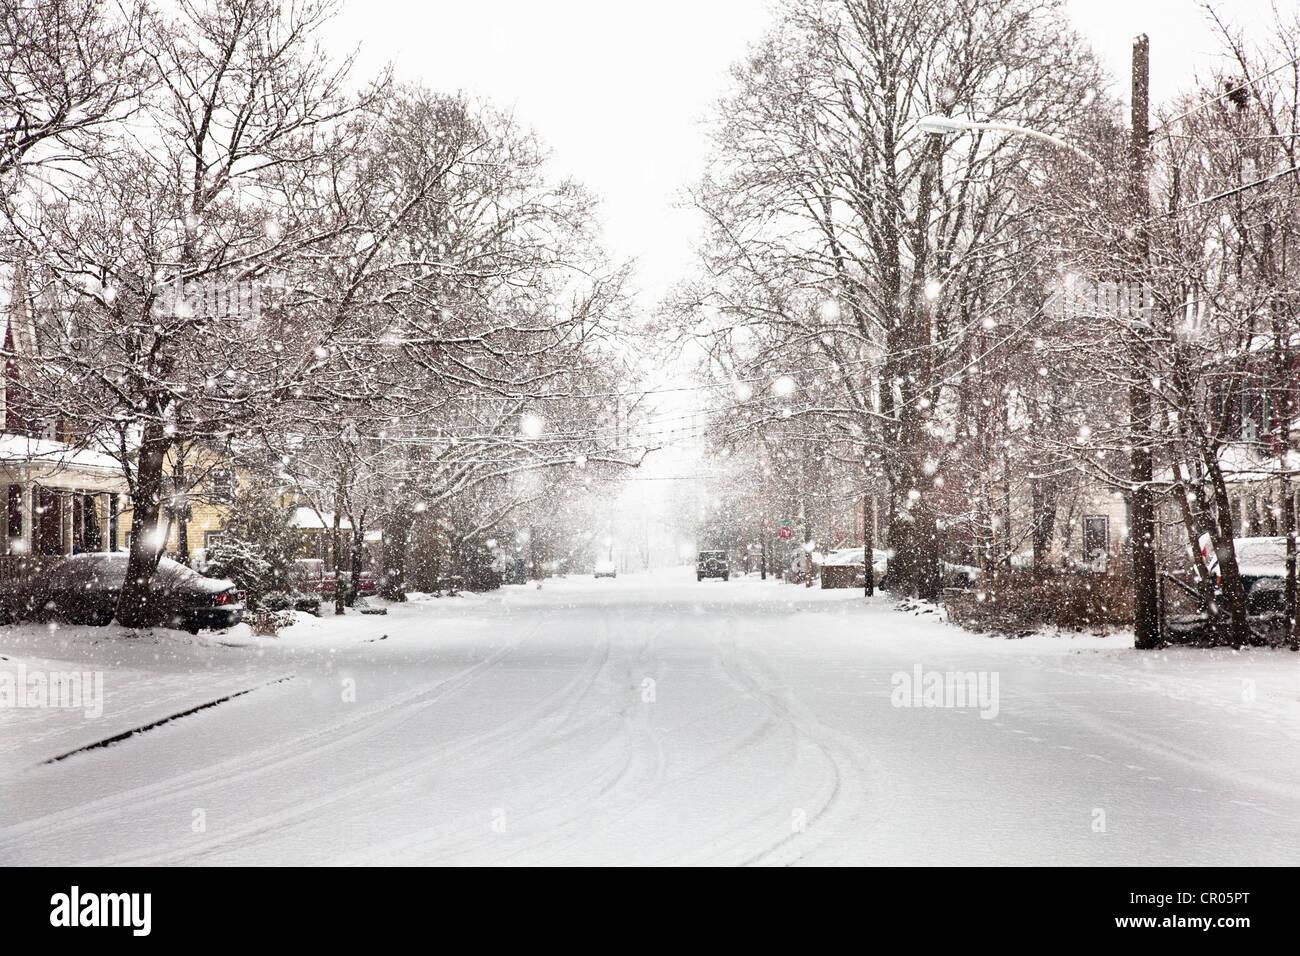 Snow falling on suburban street - Stock Image